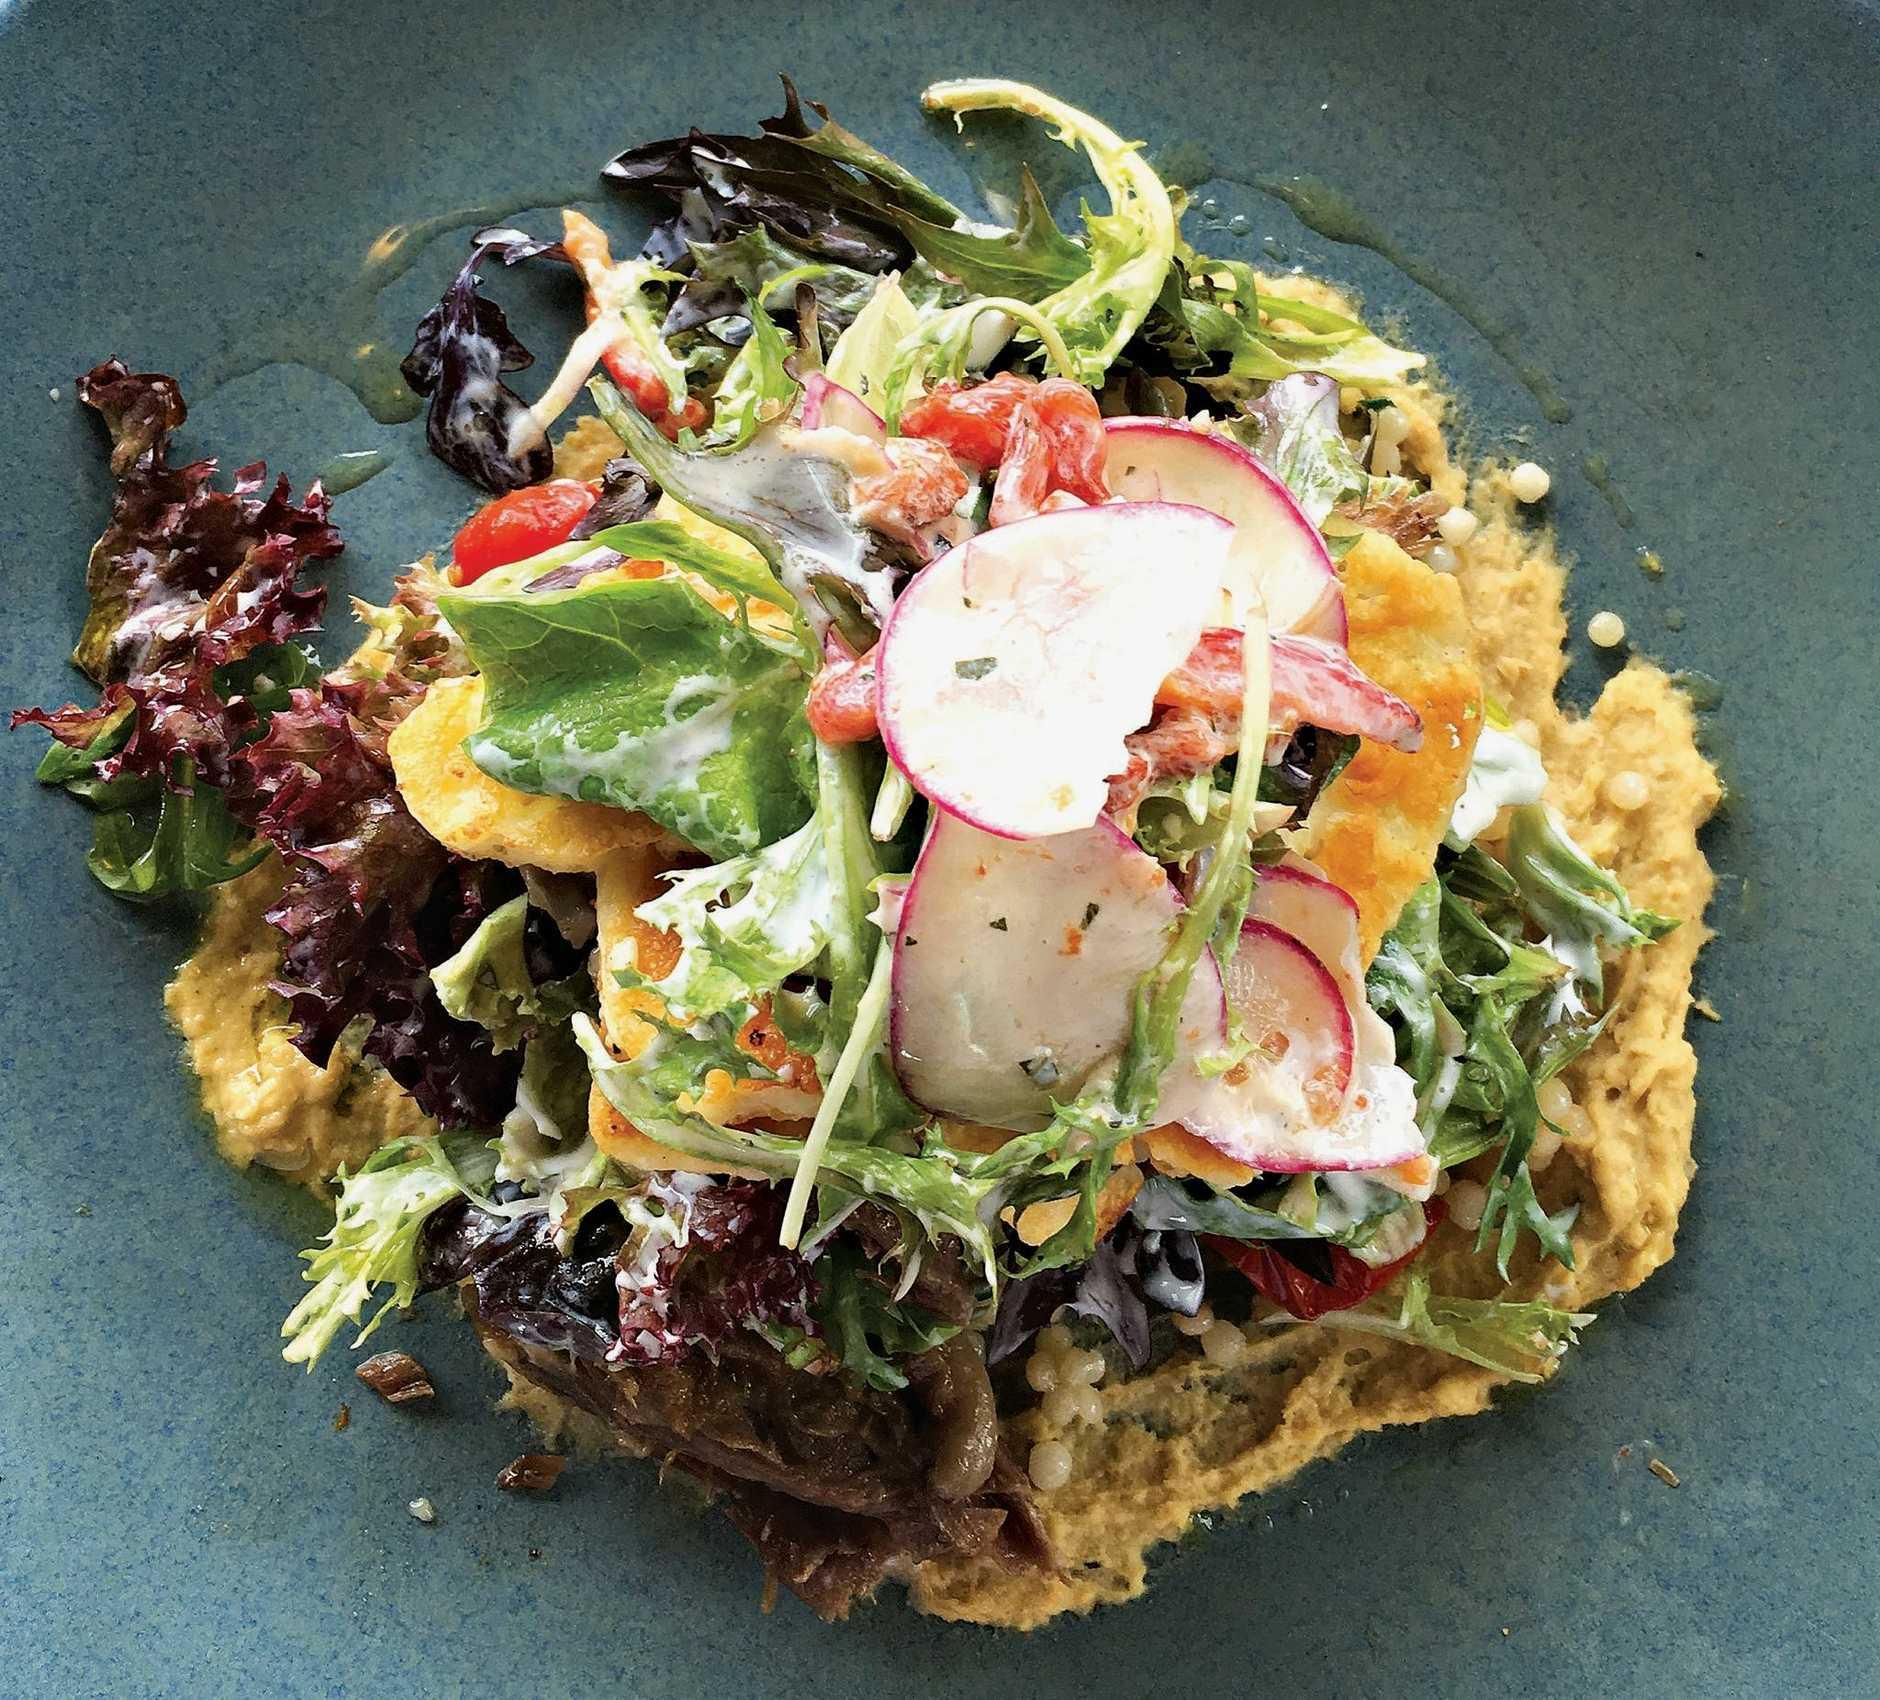 The Israeli cous cous salad at Bohemian Bungalow in Eumundi.